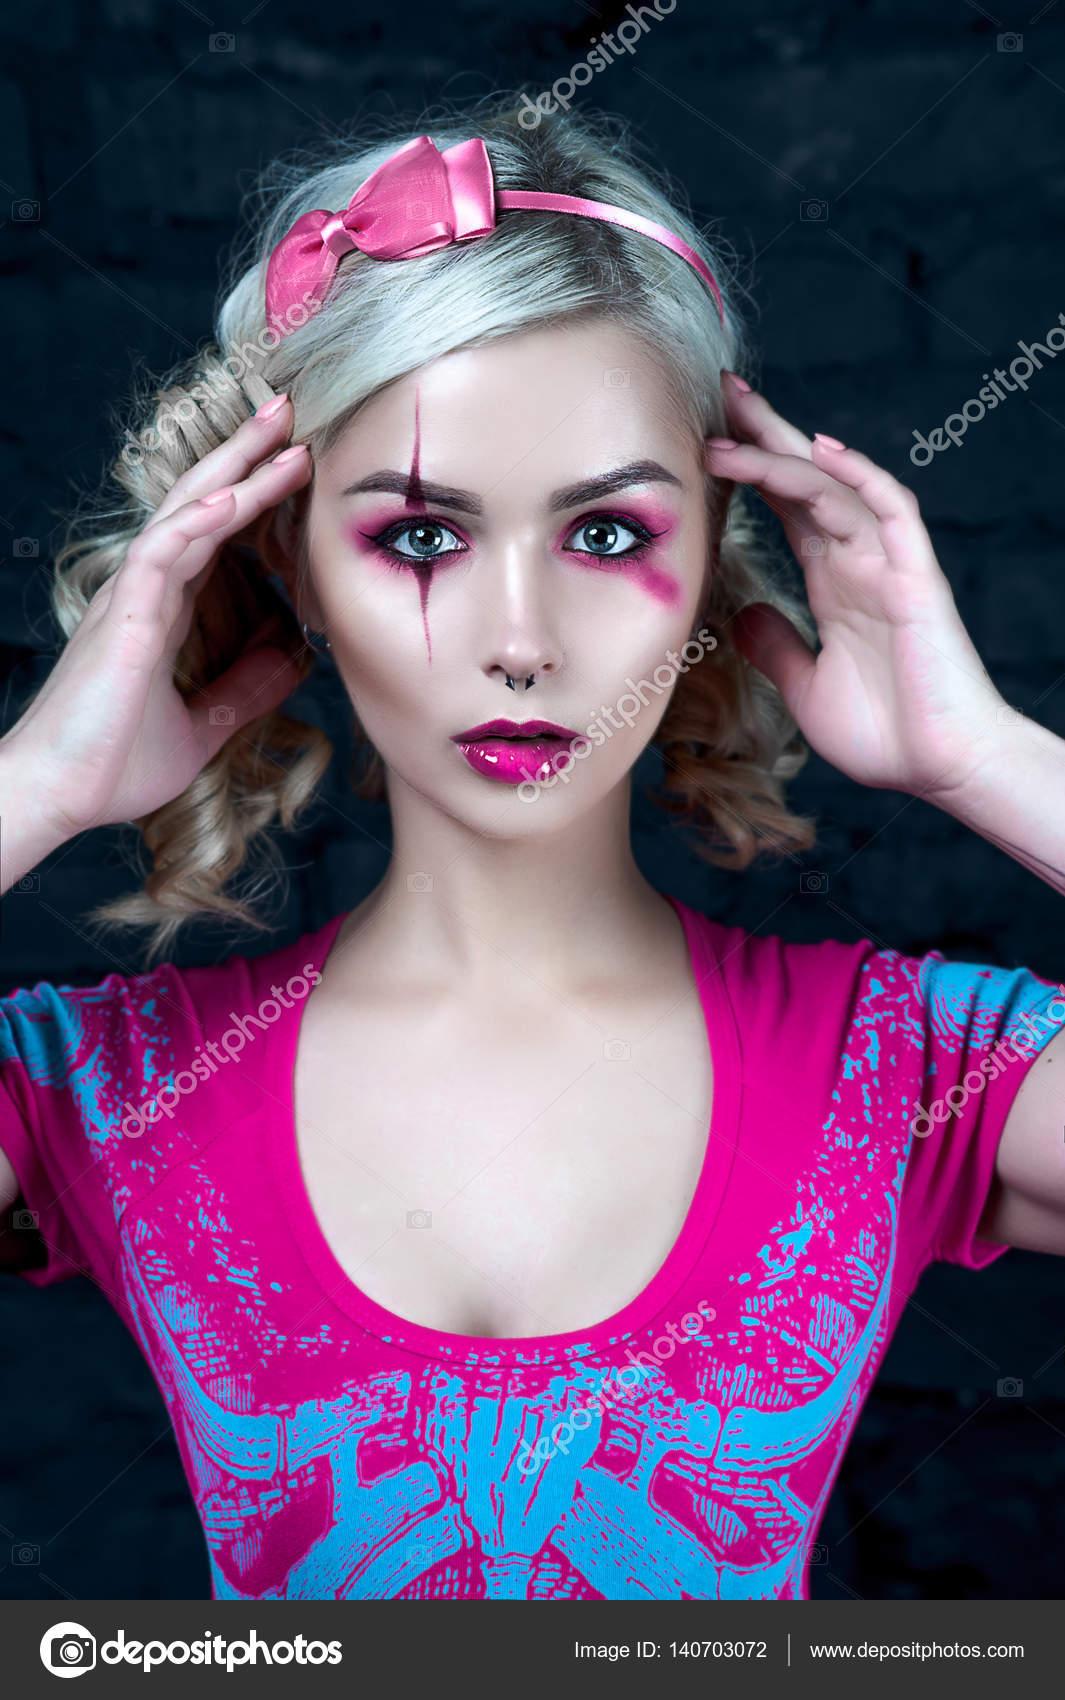 blonde-girl-in-pigtails-interacialbisexuals